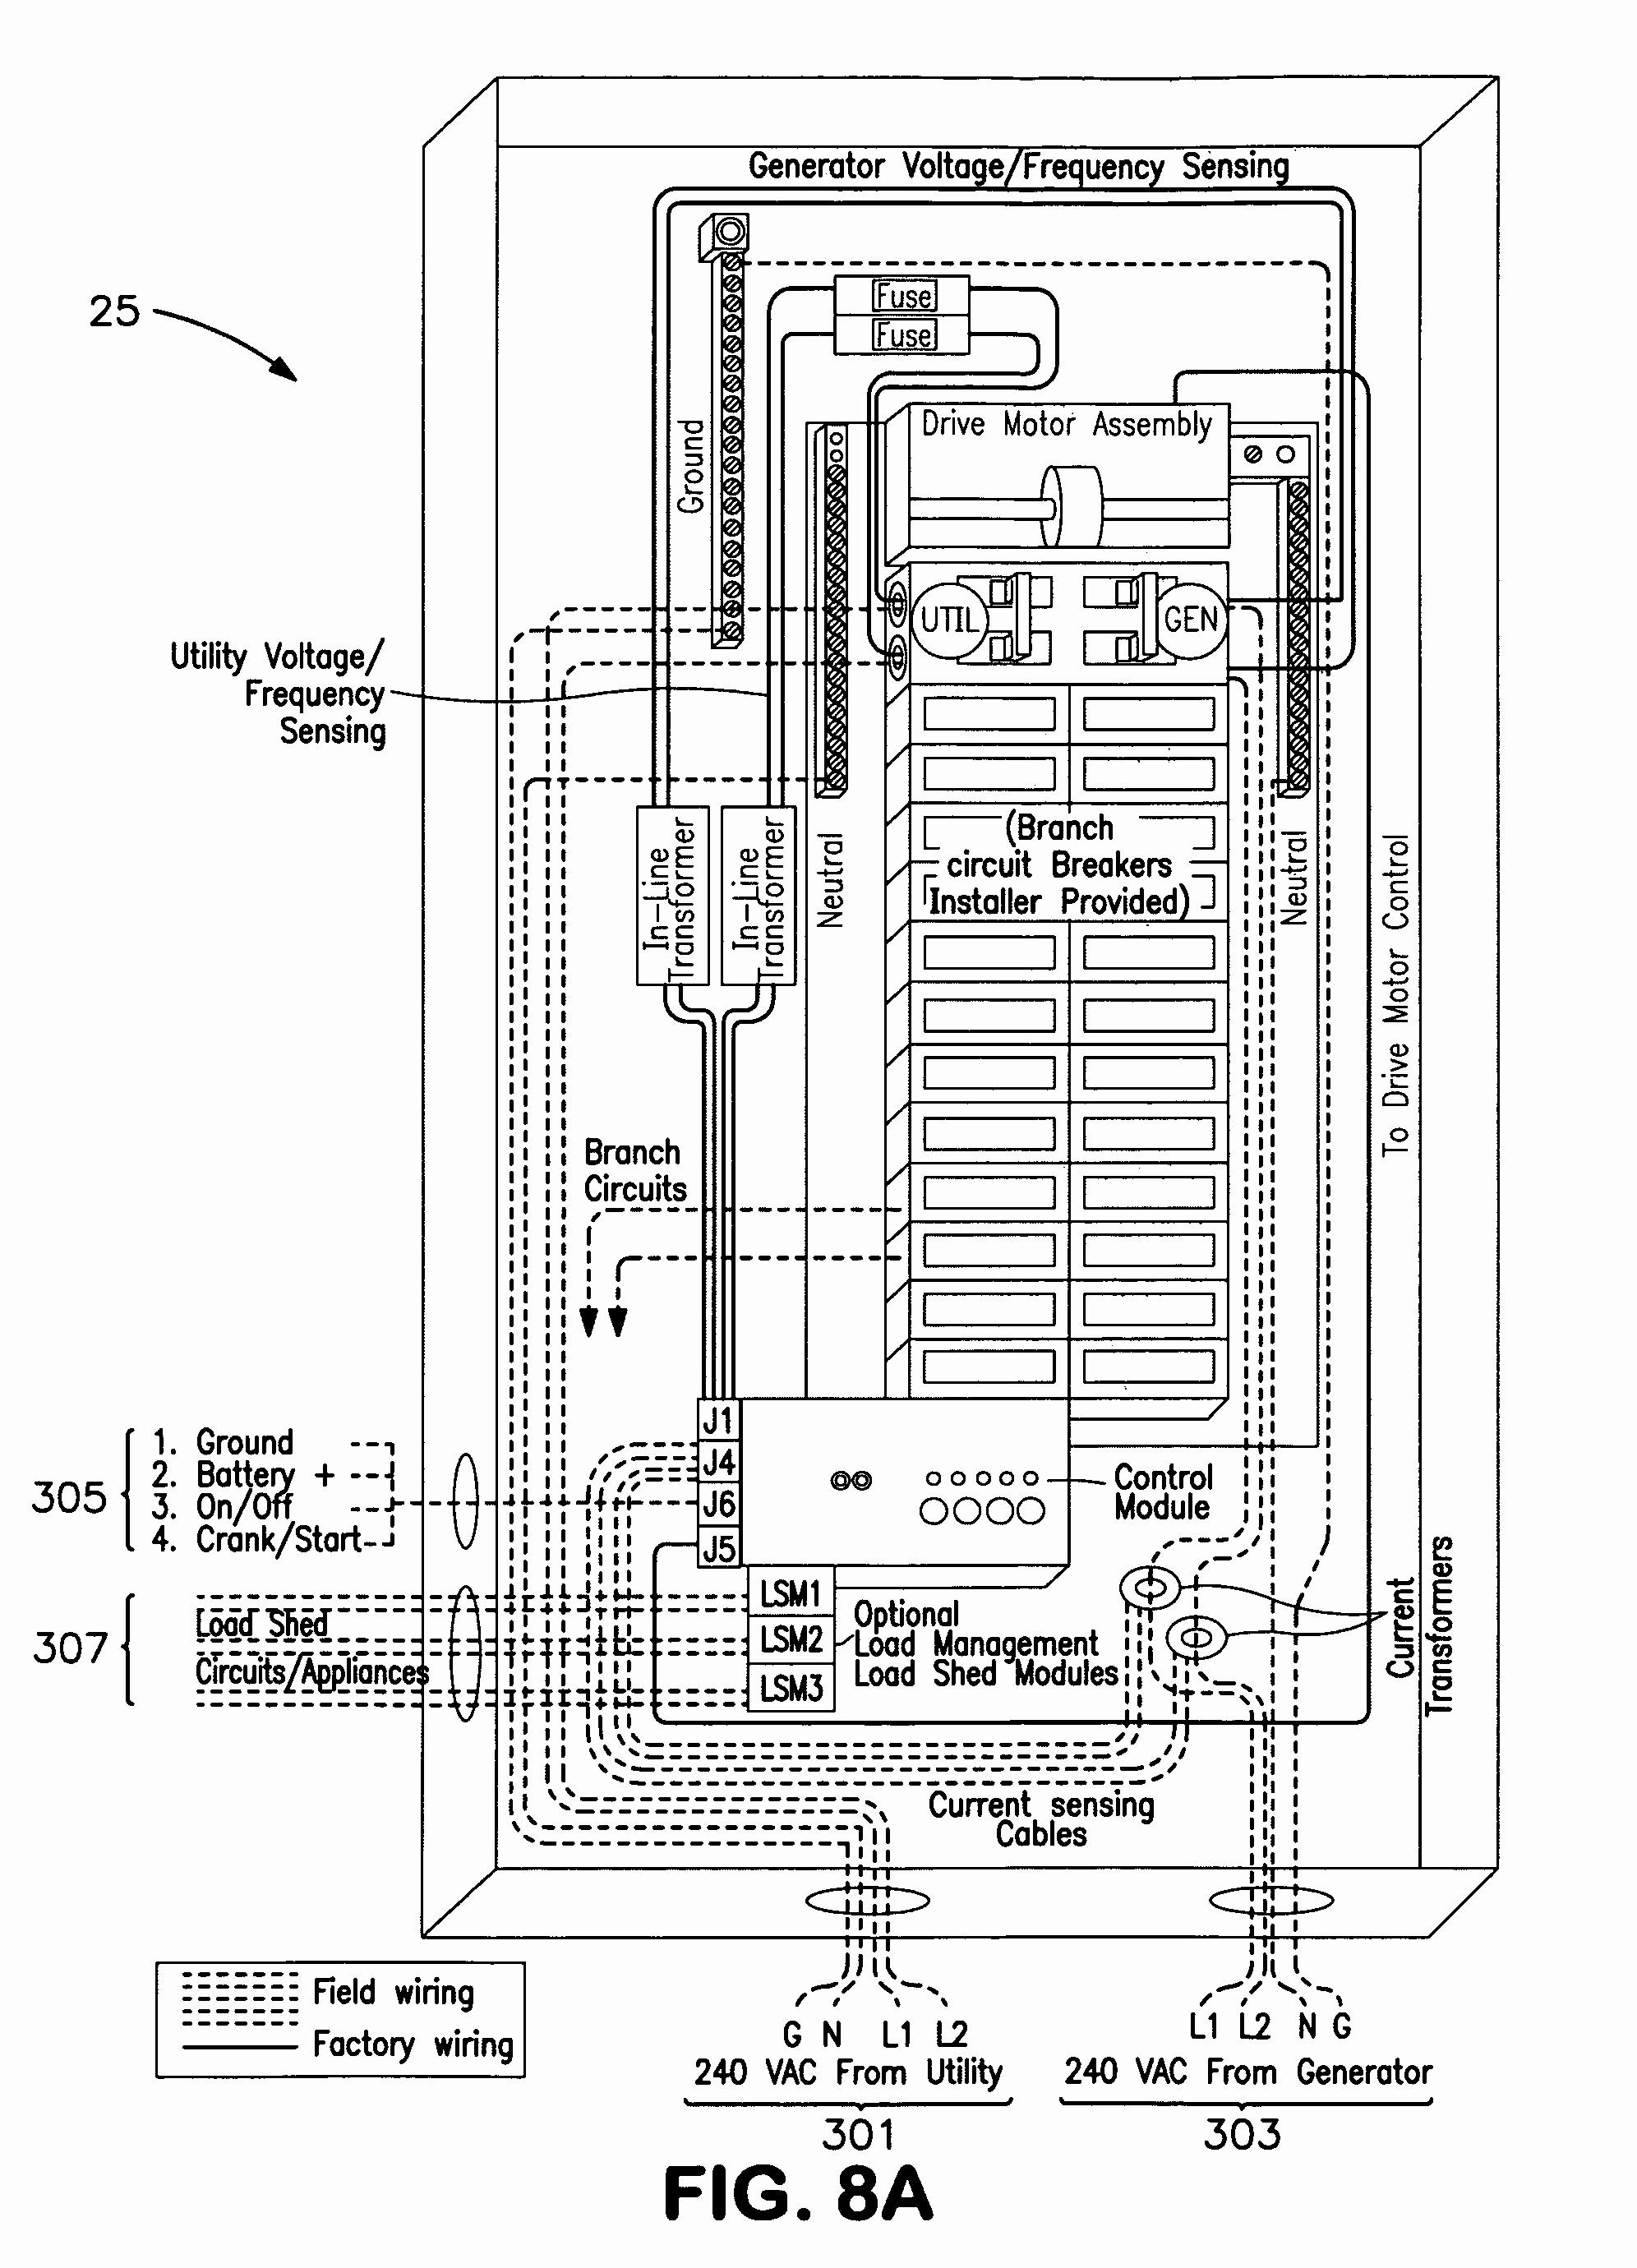 Generac Automatic Transfer Switch Wiring Diagram for Generac Automatic Transfer Switch Wiring Diagram Elegant Amazing